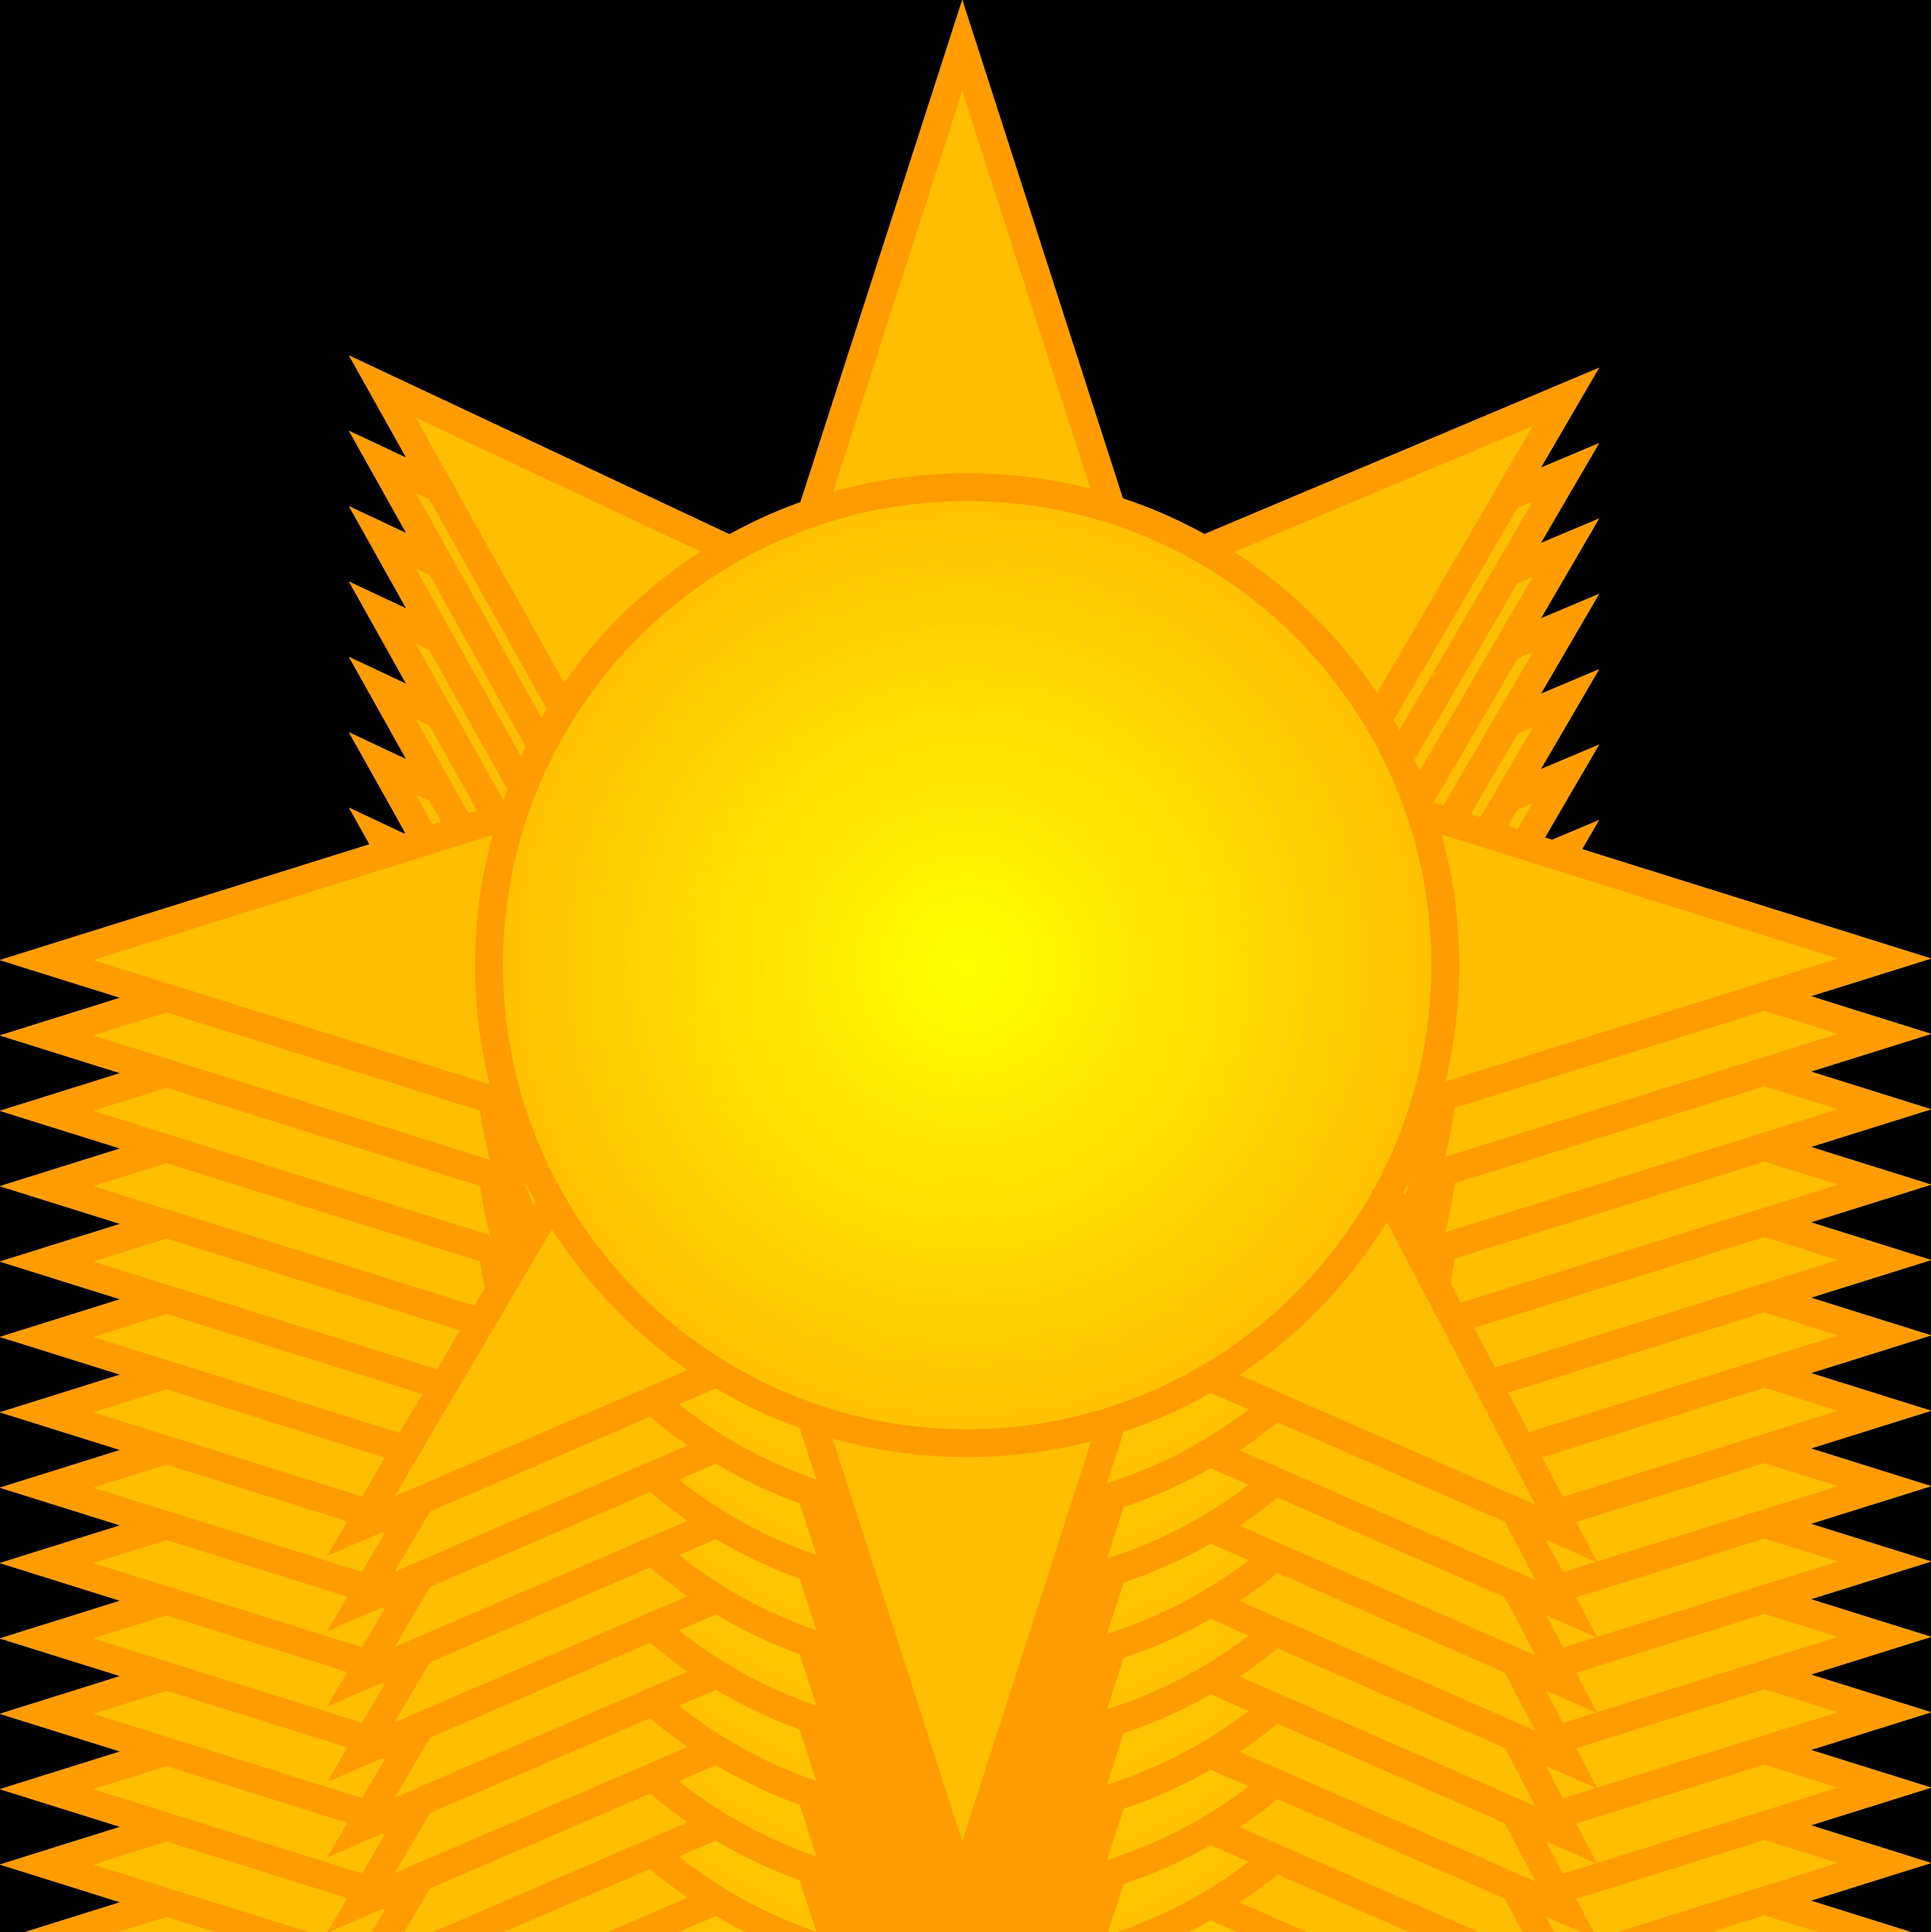 5789x5793 Sun Star Clipart, Explore Pictures